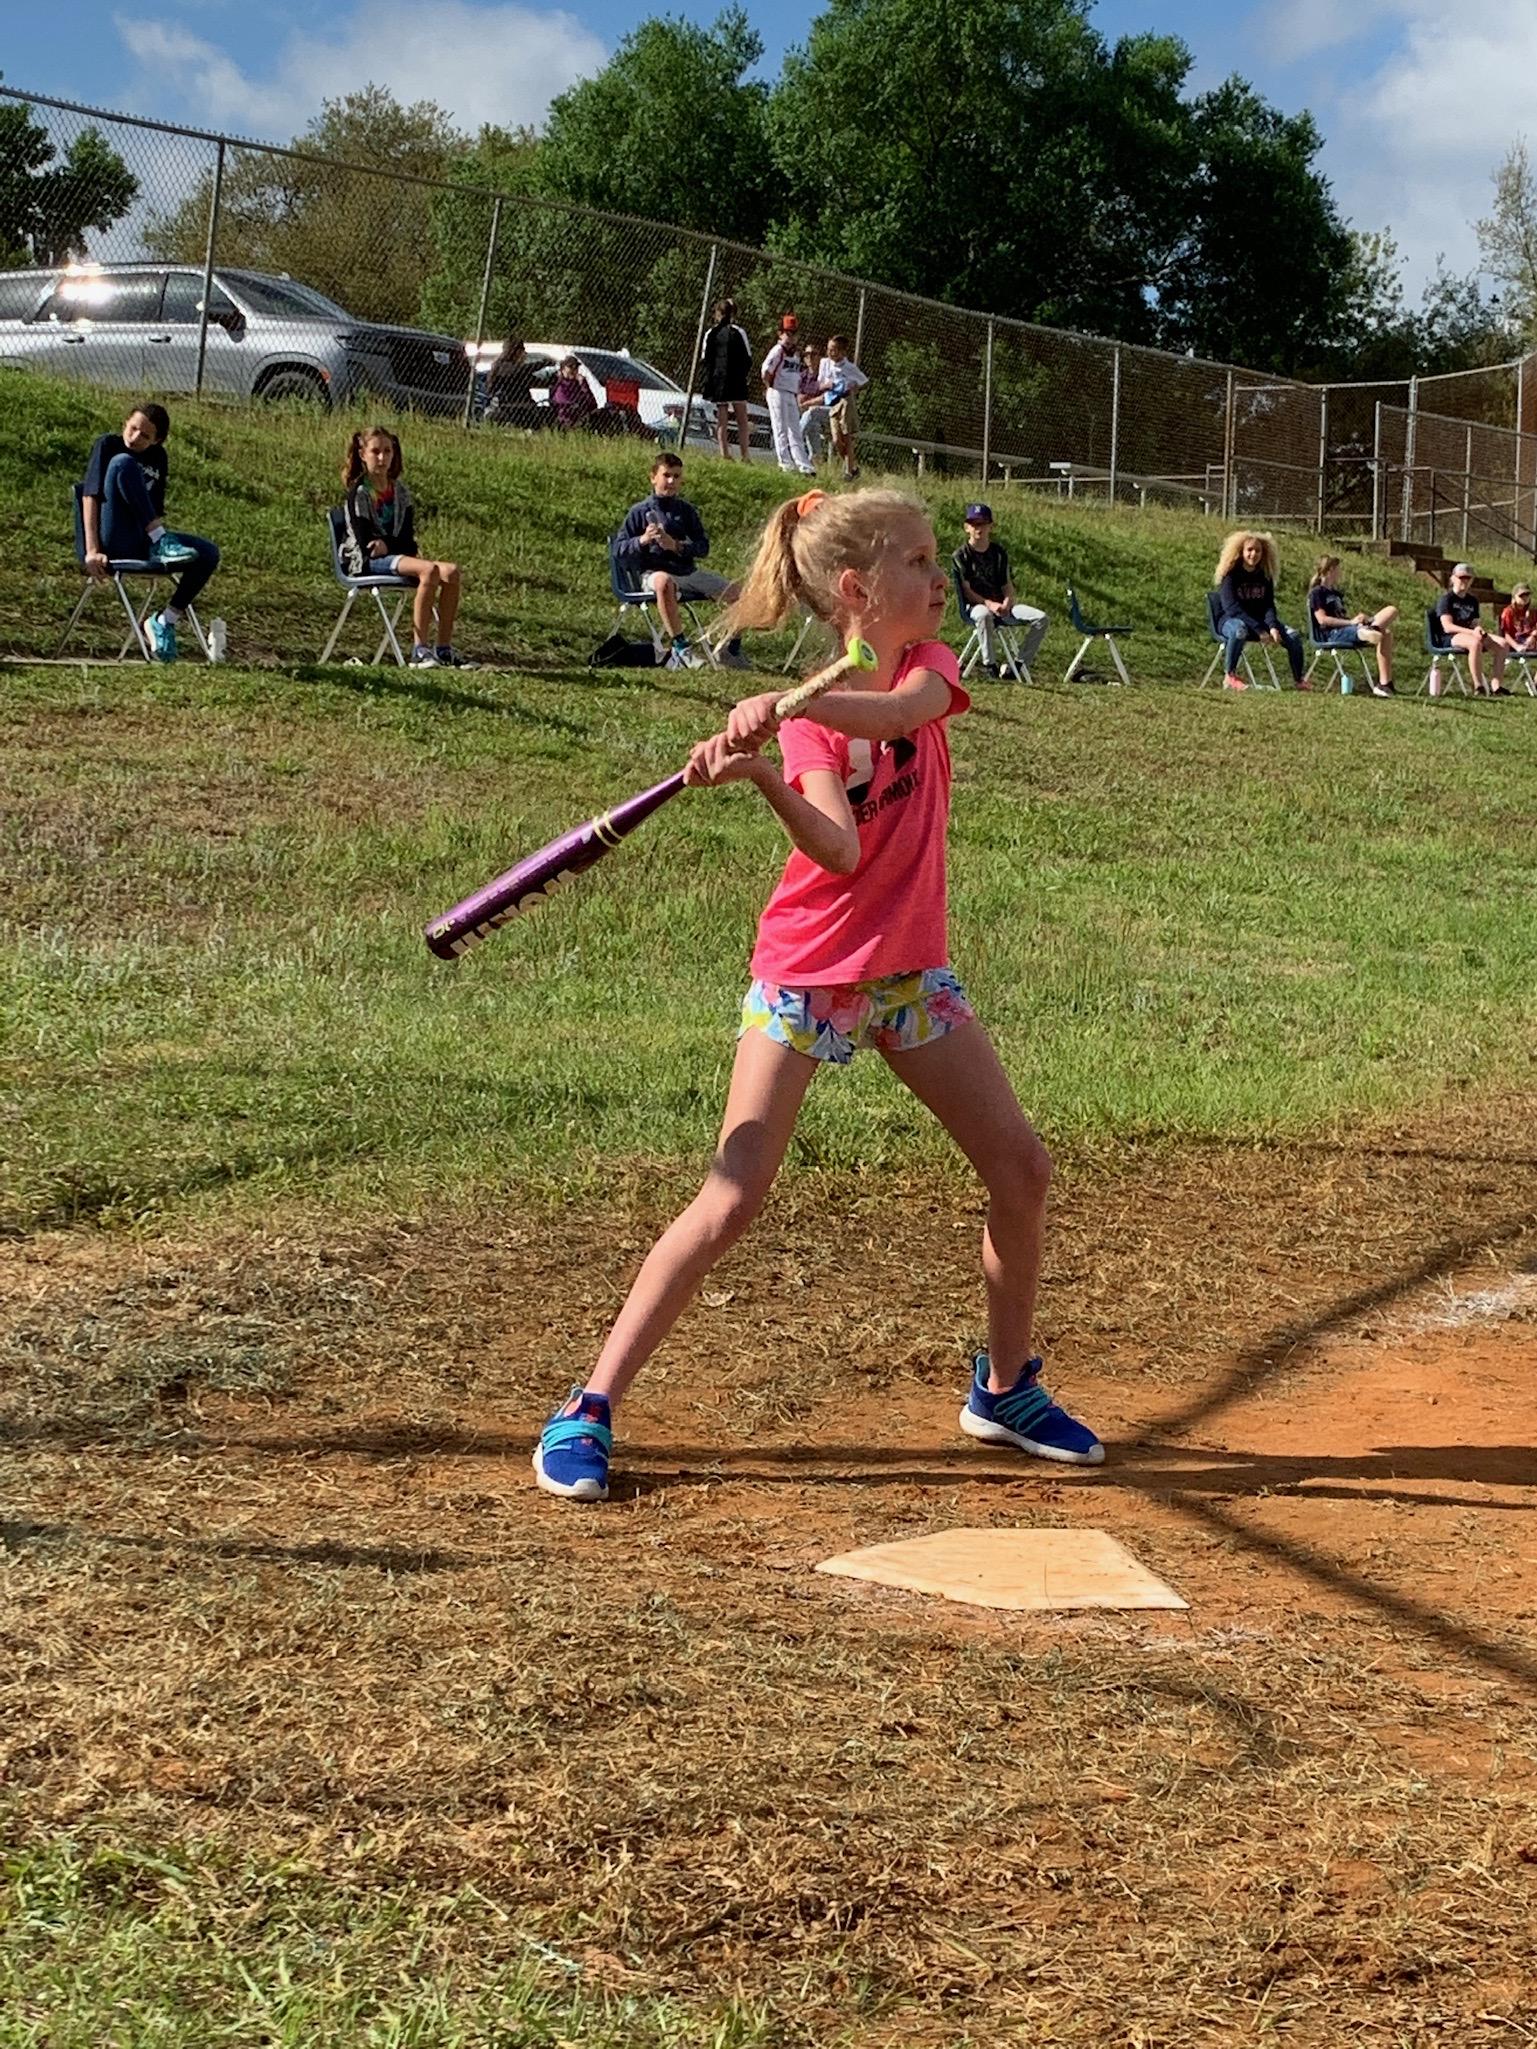 A 5th grade student batting.